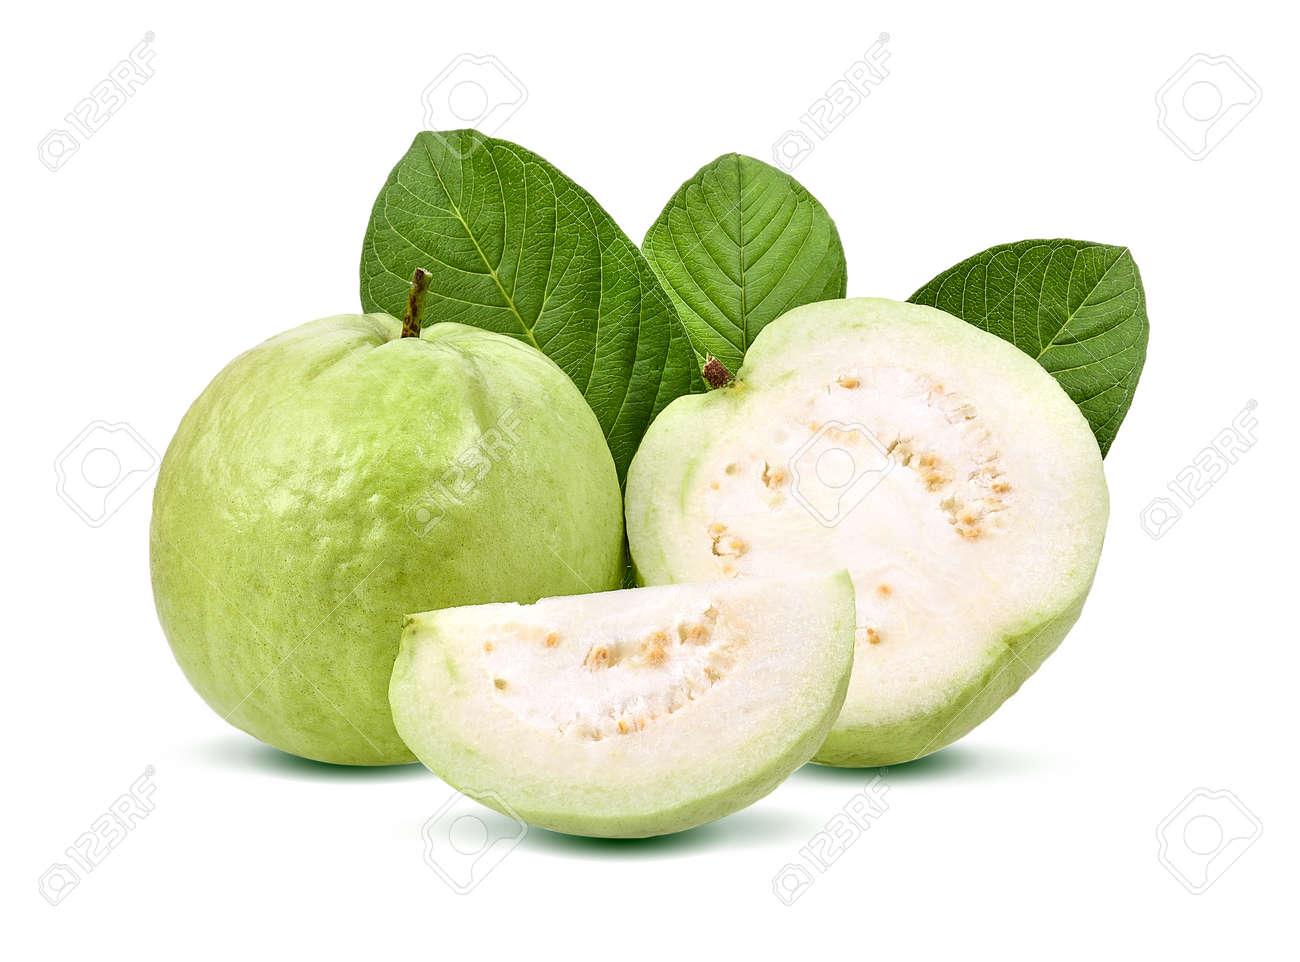 Guava fruit isolated on white background. - 87920714